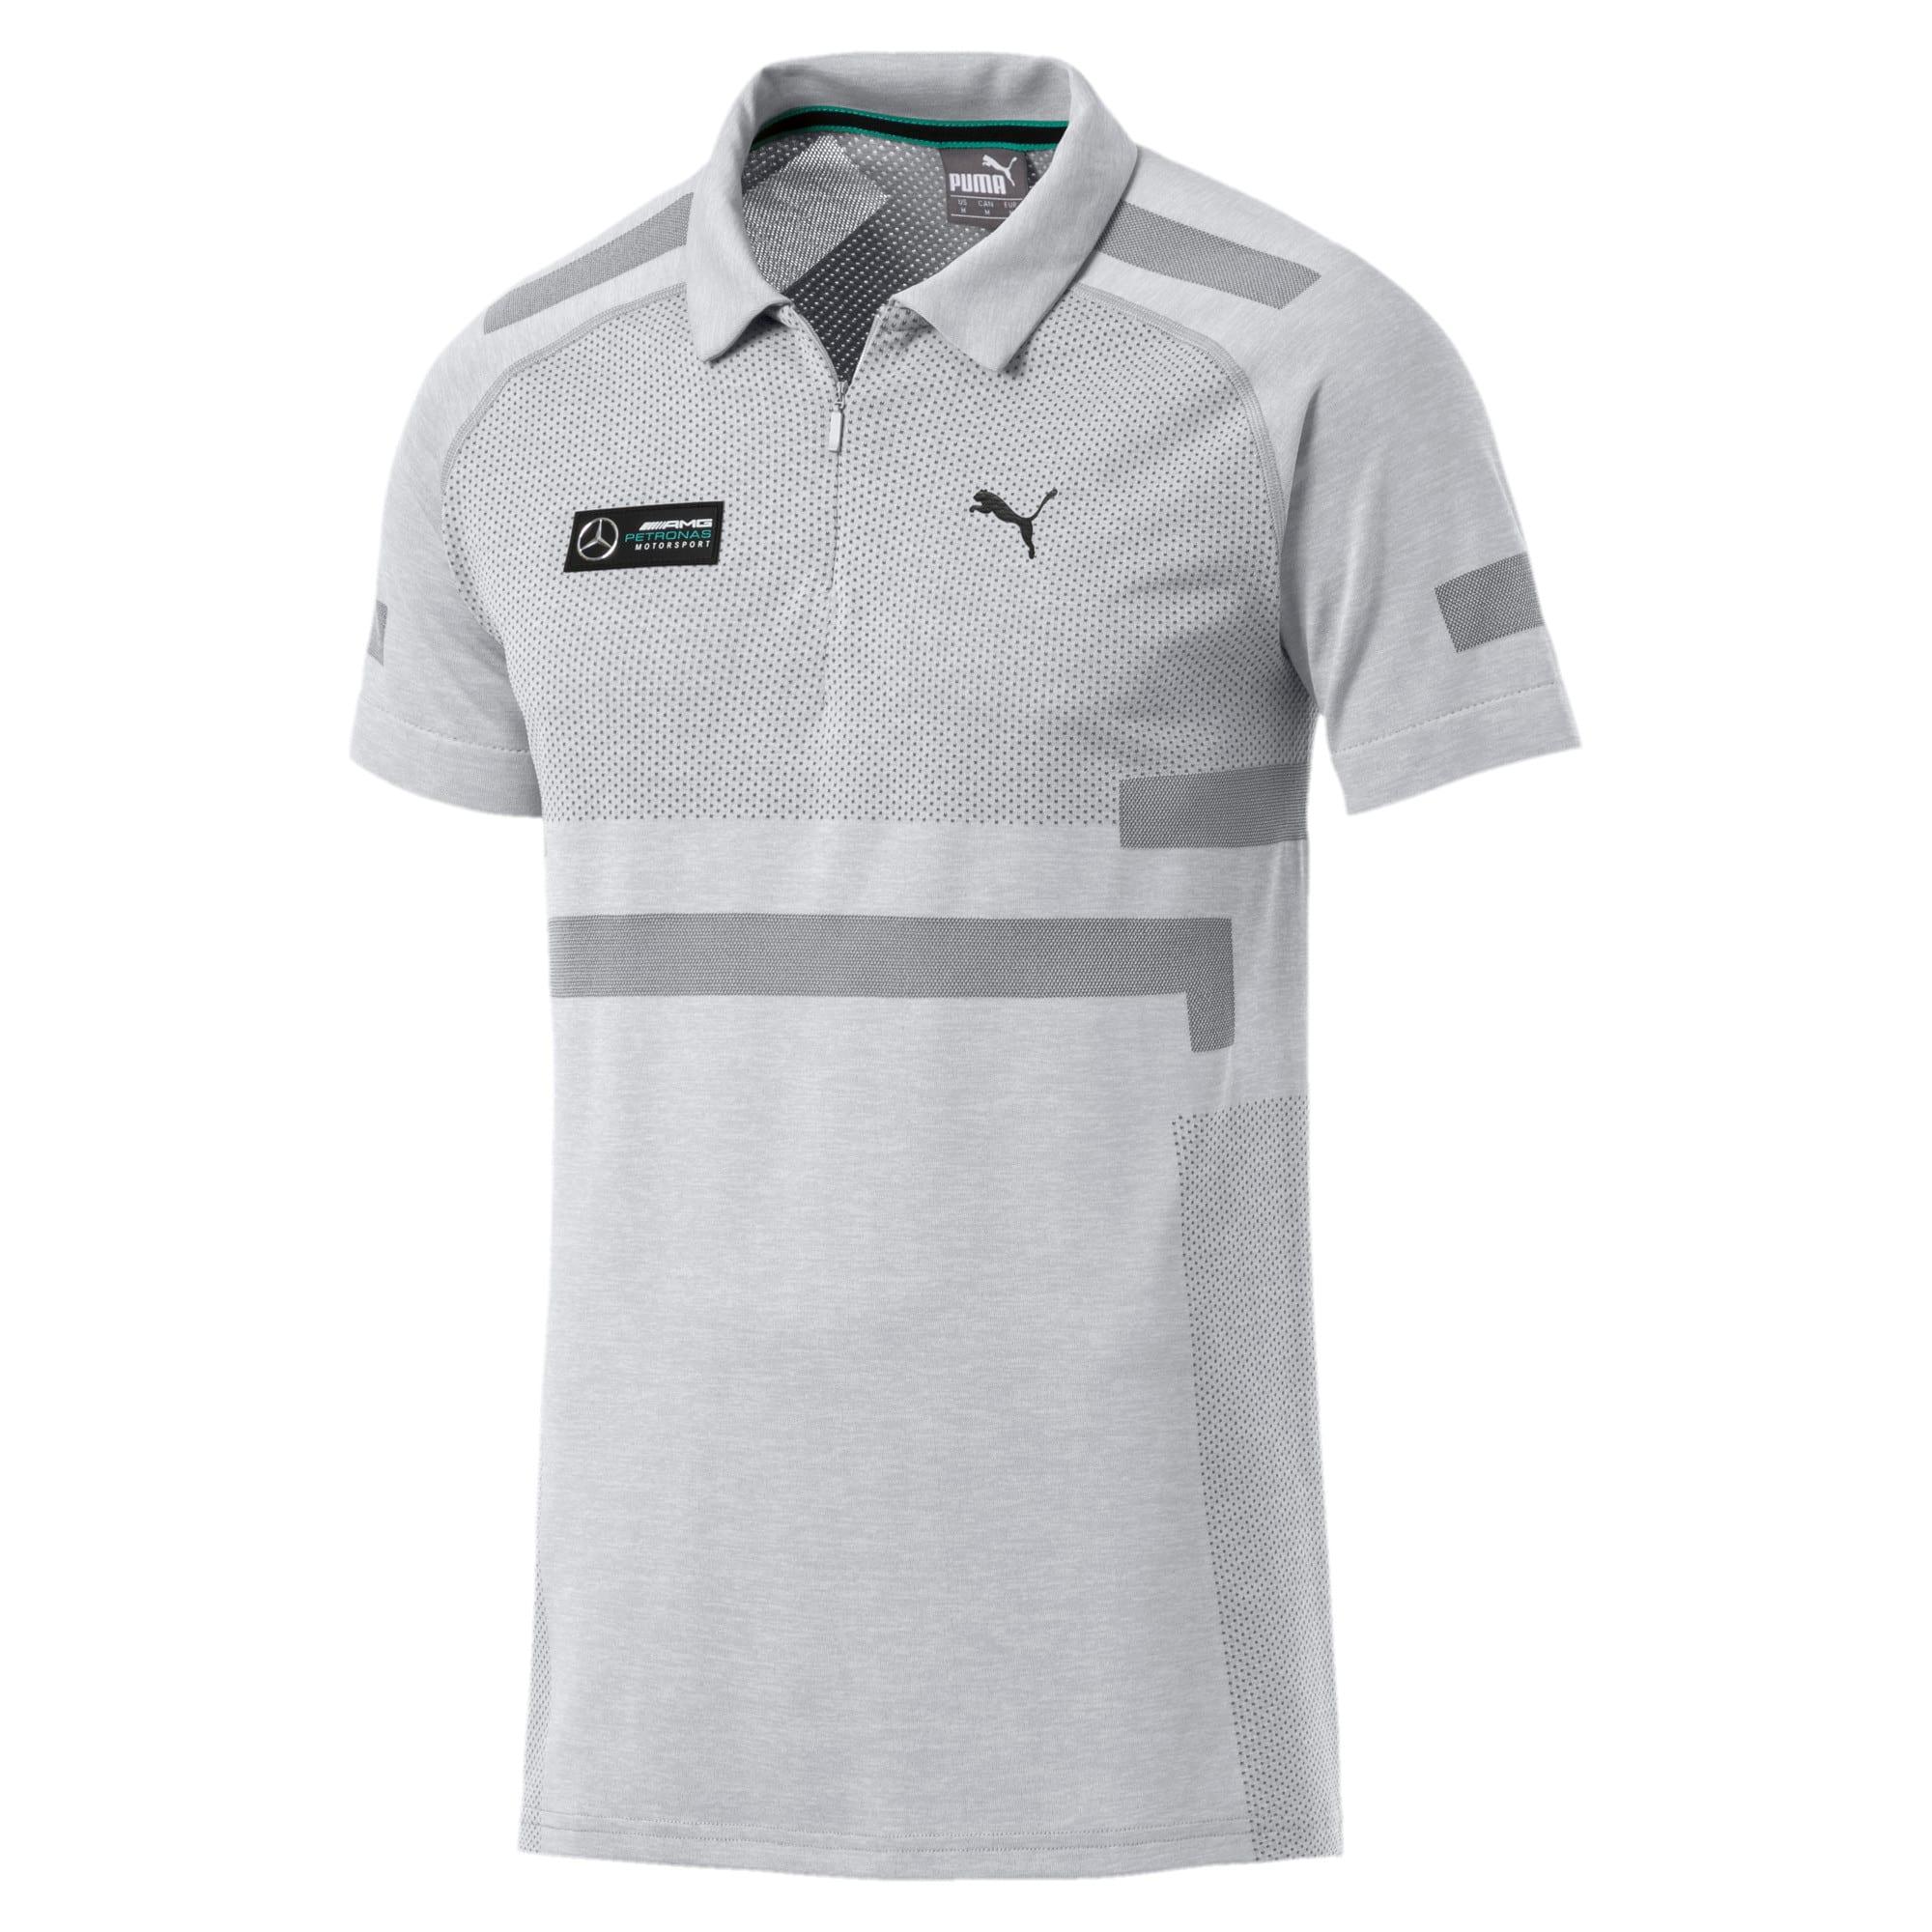 Thumbnail 4 of Mercedes AMG Petronas evoKNIT Polo, Mercedes Team Silver, medium